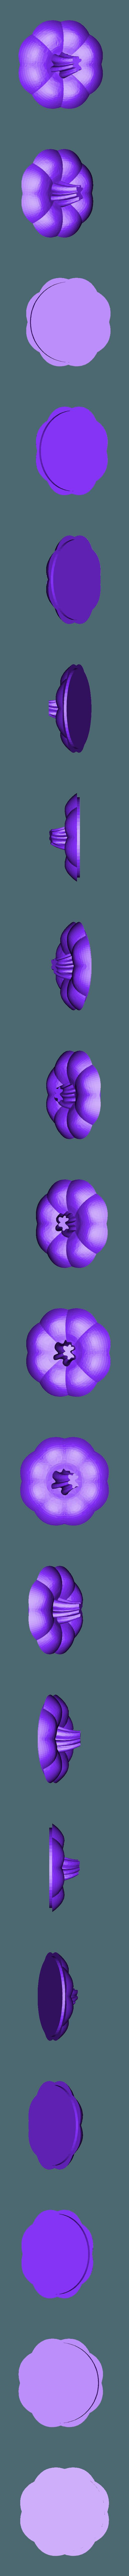 Pumpkin-JOL-TopA_v1.1.stl Télécharger fichier STL gratuit Halloween Jack-O-Lantern ! • Design imprimable en 3D, MakerMathieu